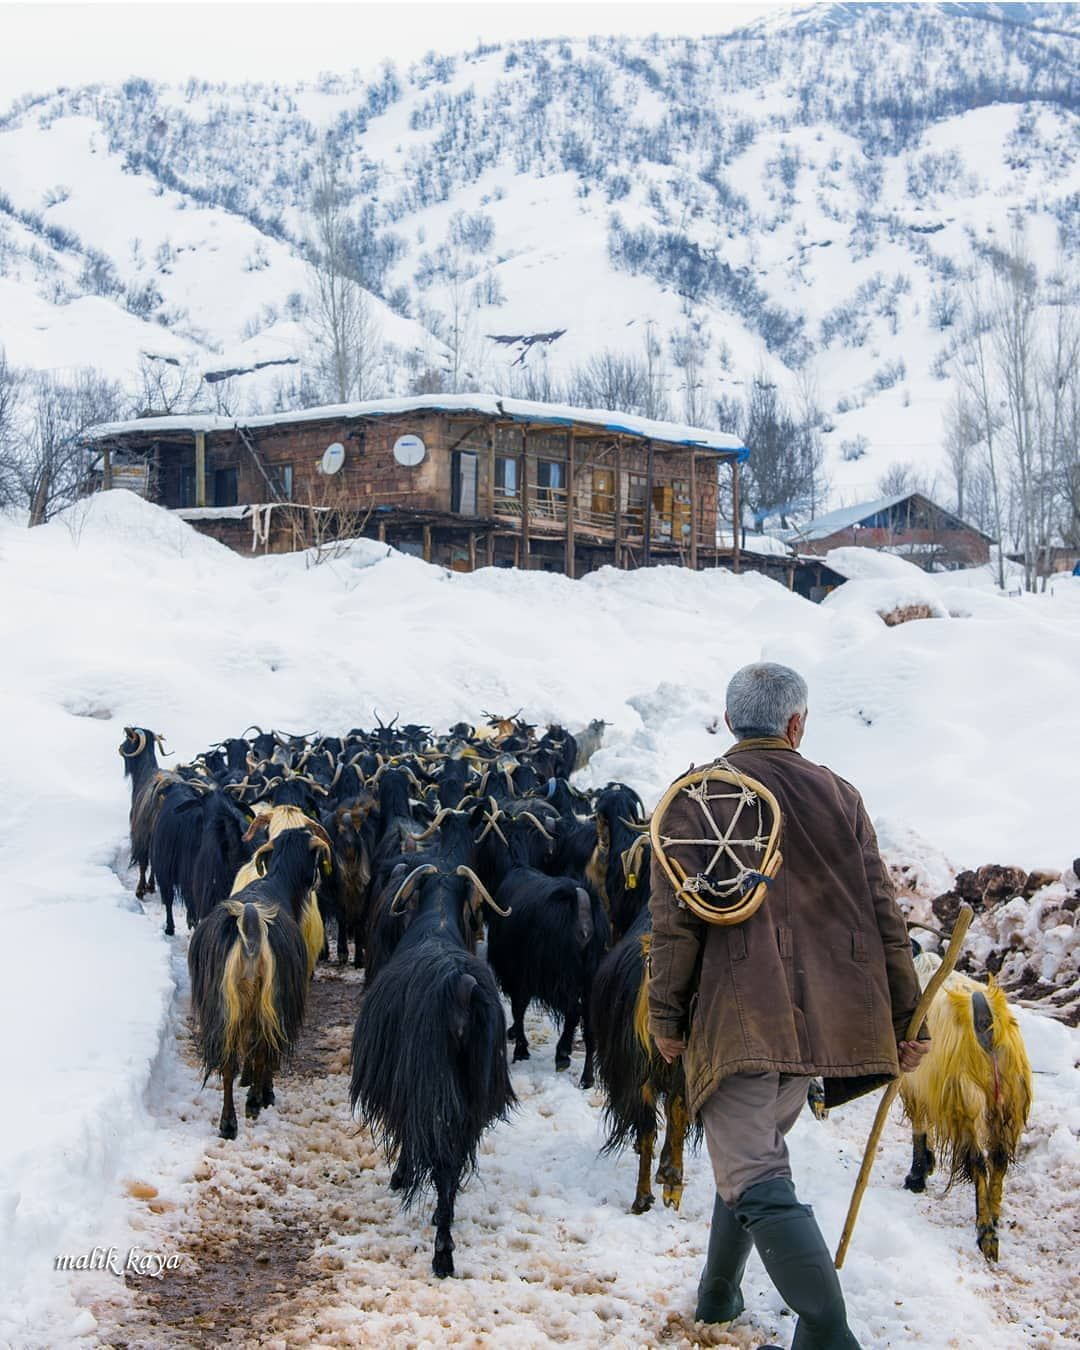 617 Begenme 9 Yorum Instagram Da Anadolu Albumu Anadolualbum Suru Yolda Fotograf Malik Kaya Anadolualbum Instagram Horses Outdoor